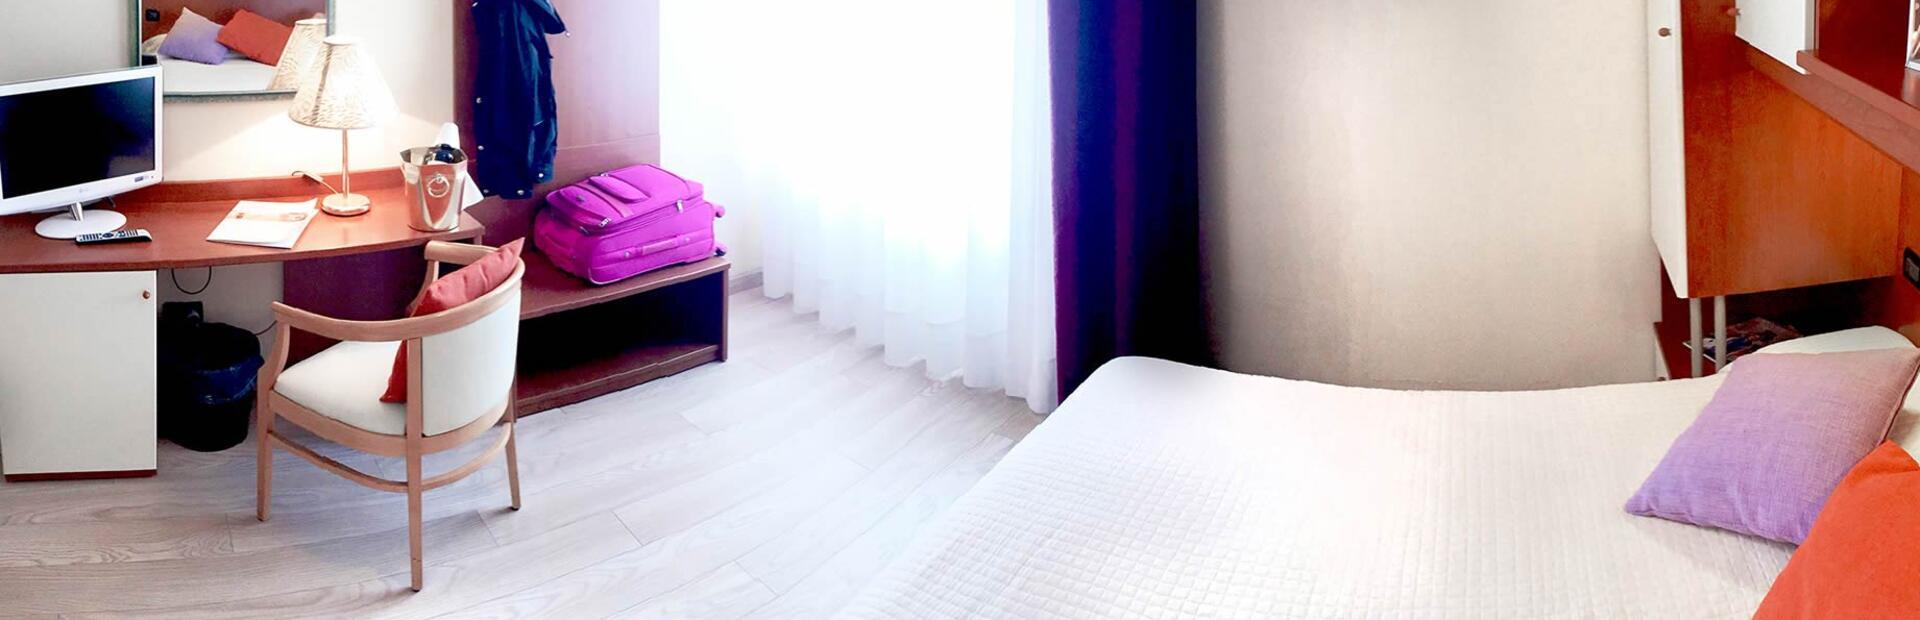 hotel-sole de zimmer 001